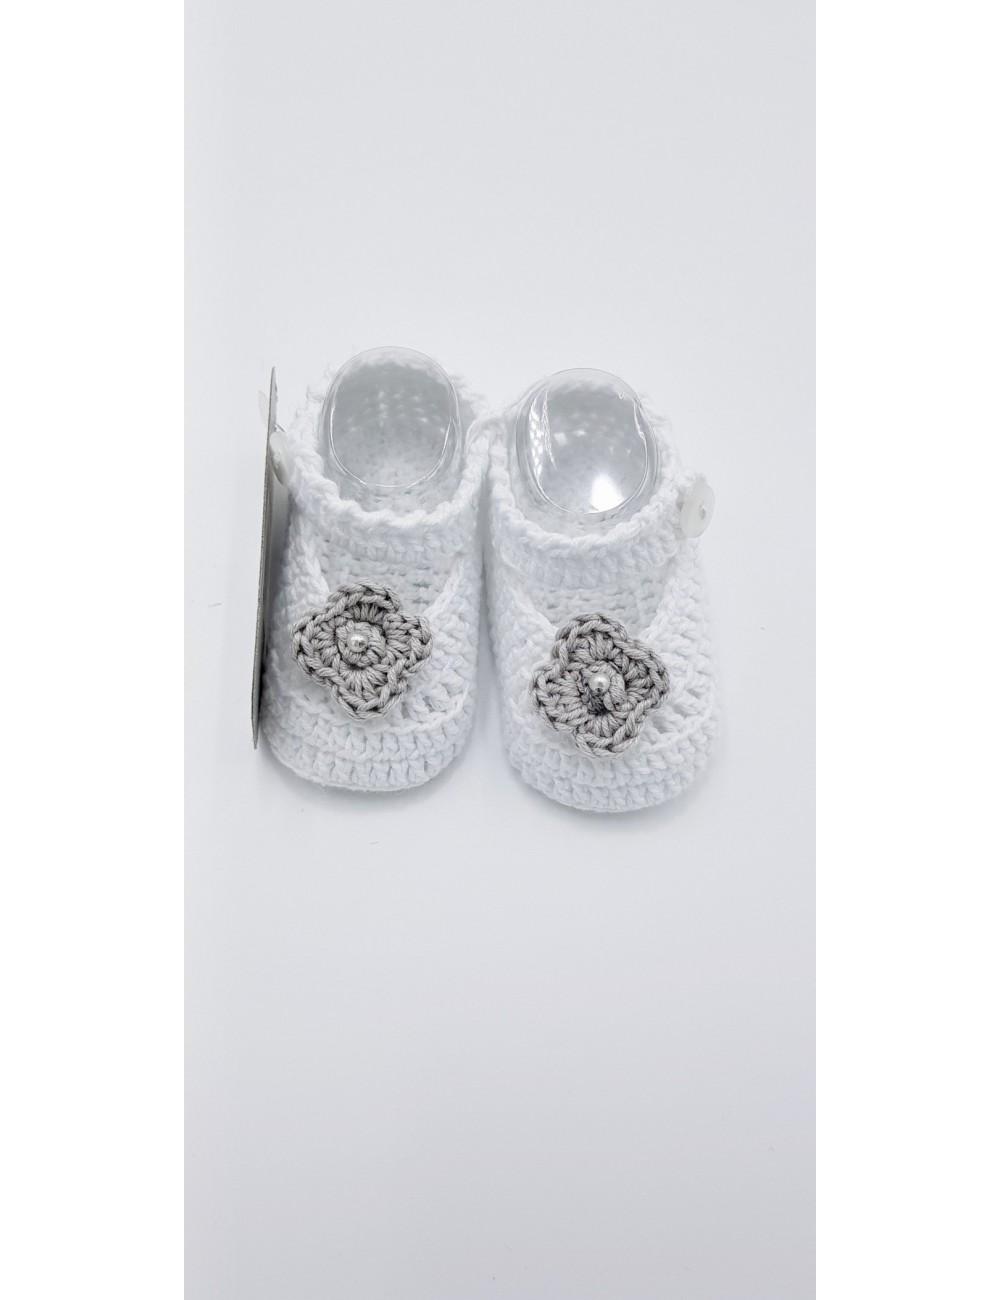 Zapato Con Gris Blanco Hilo De rCthQds